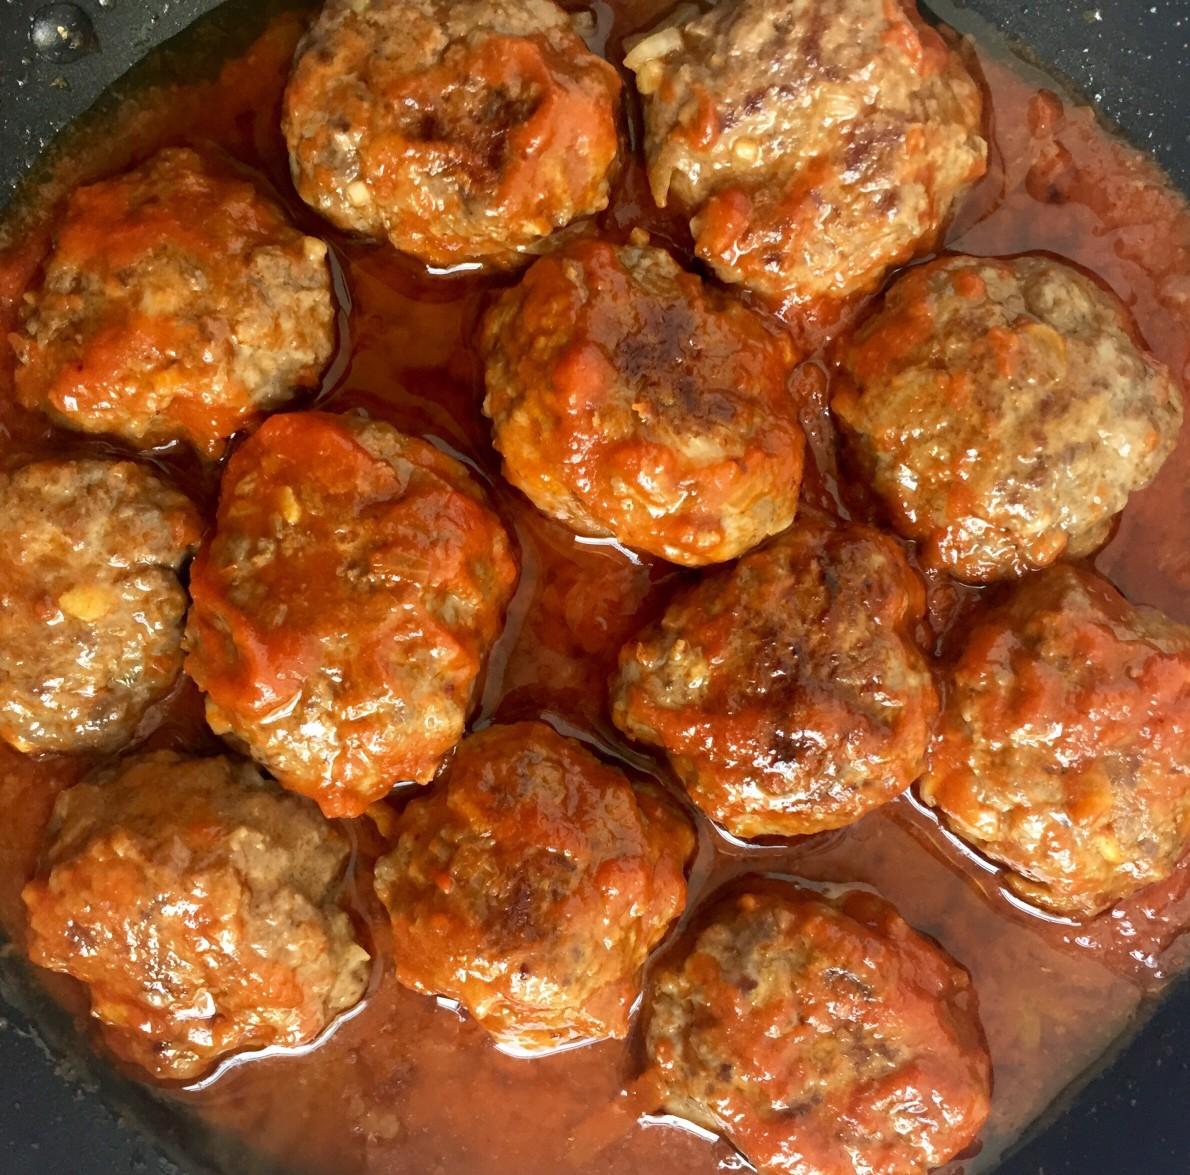 meatballs t20 Ae9YKW Eat-Your-Veggies Italian Meatballs